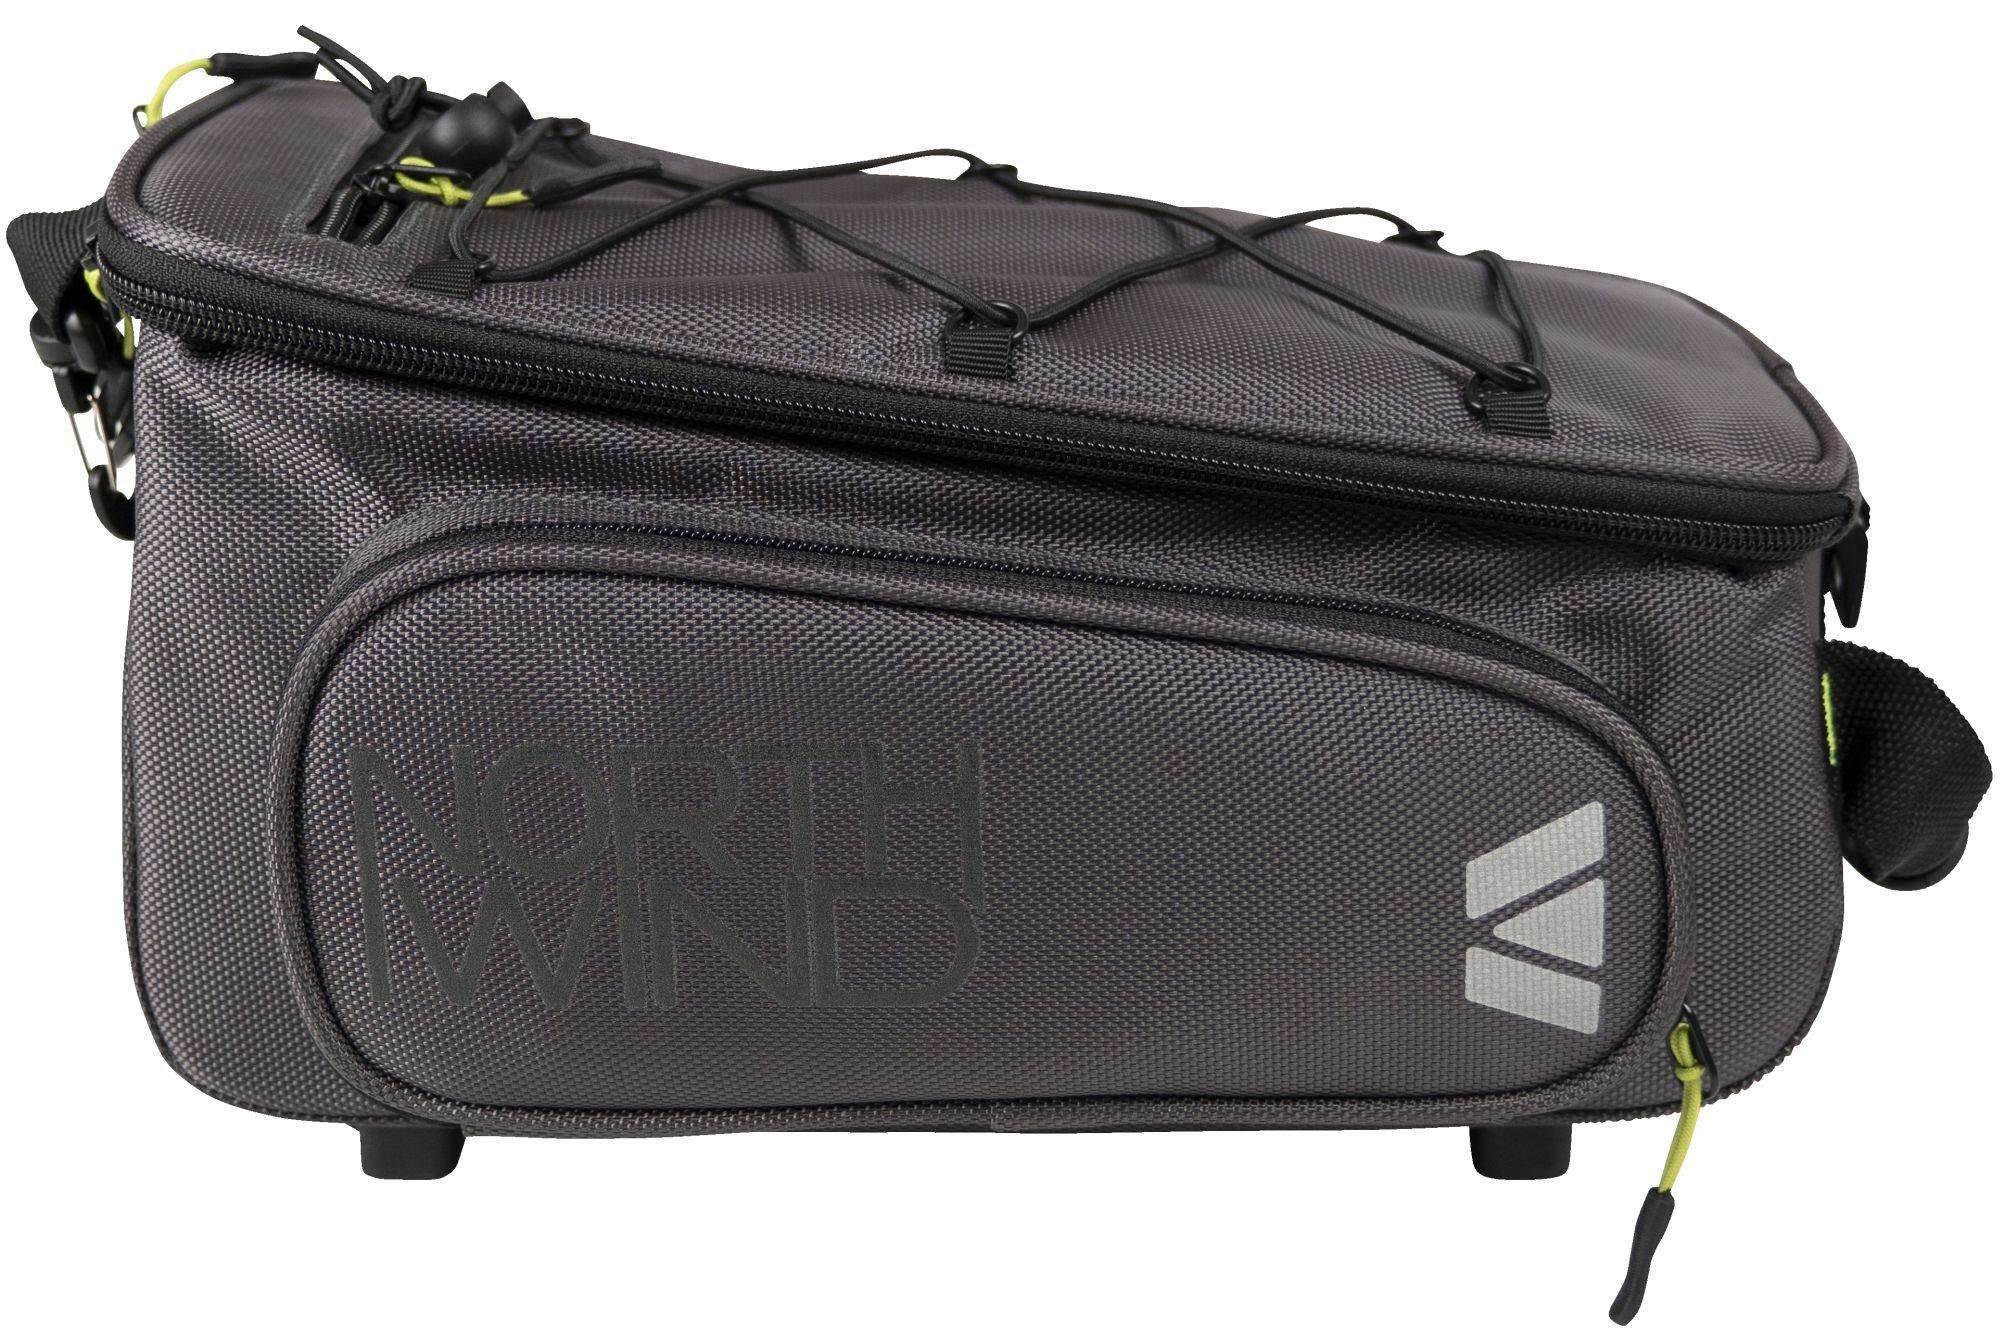 Fahrradteile/Koffer & Körbe: Northwind  Gepäckträgertasche Smartbag Classic 2.0 i-Rack II ()